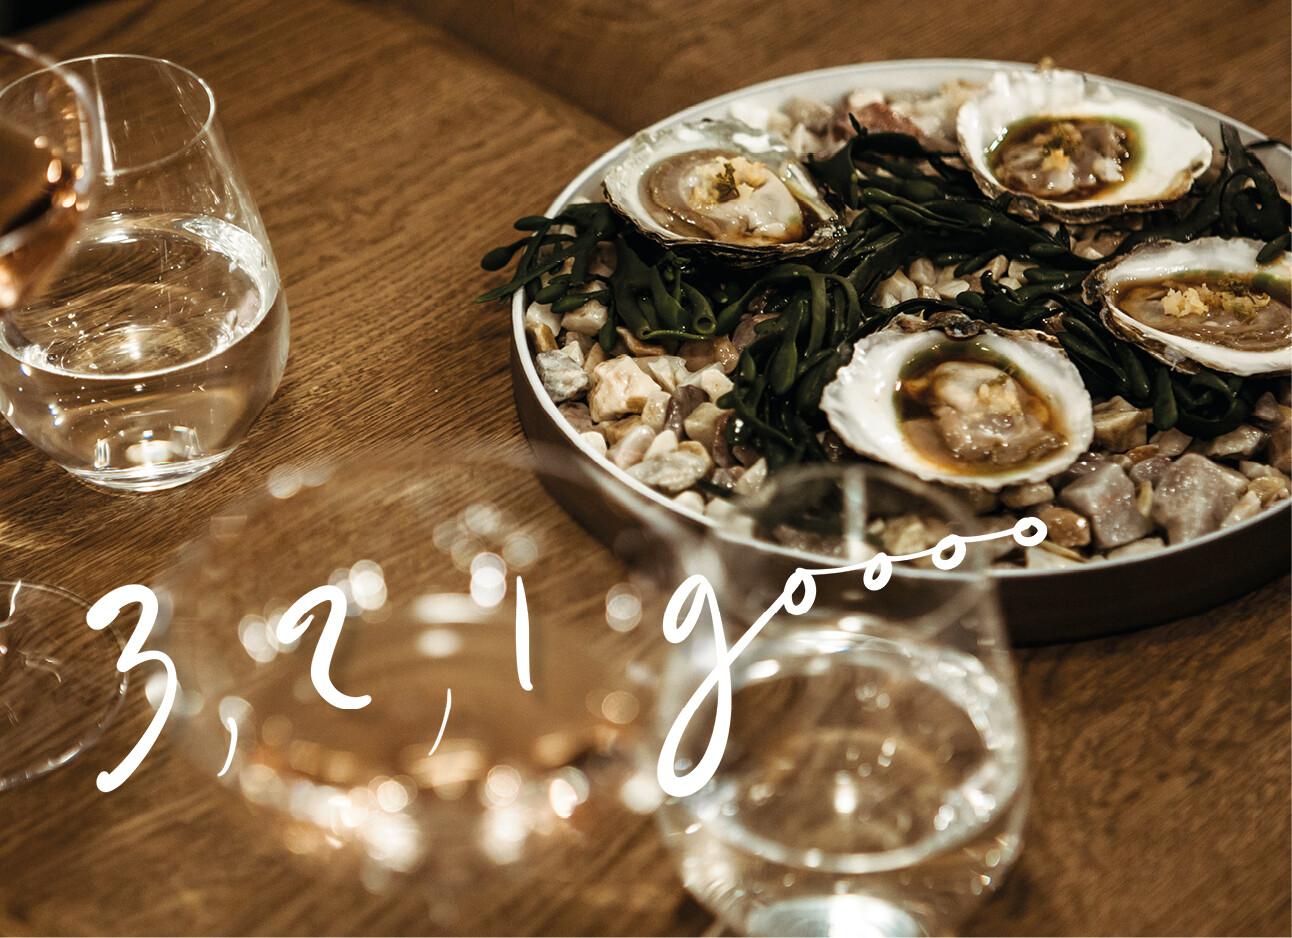 oesters bord wijn glazen houten tafel